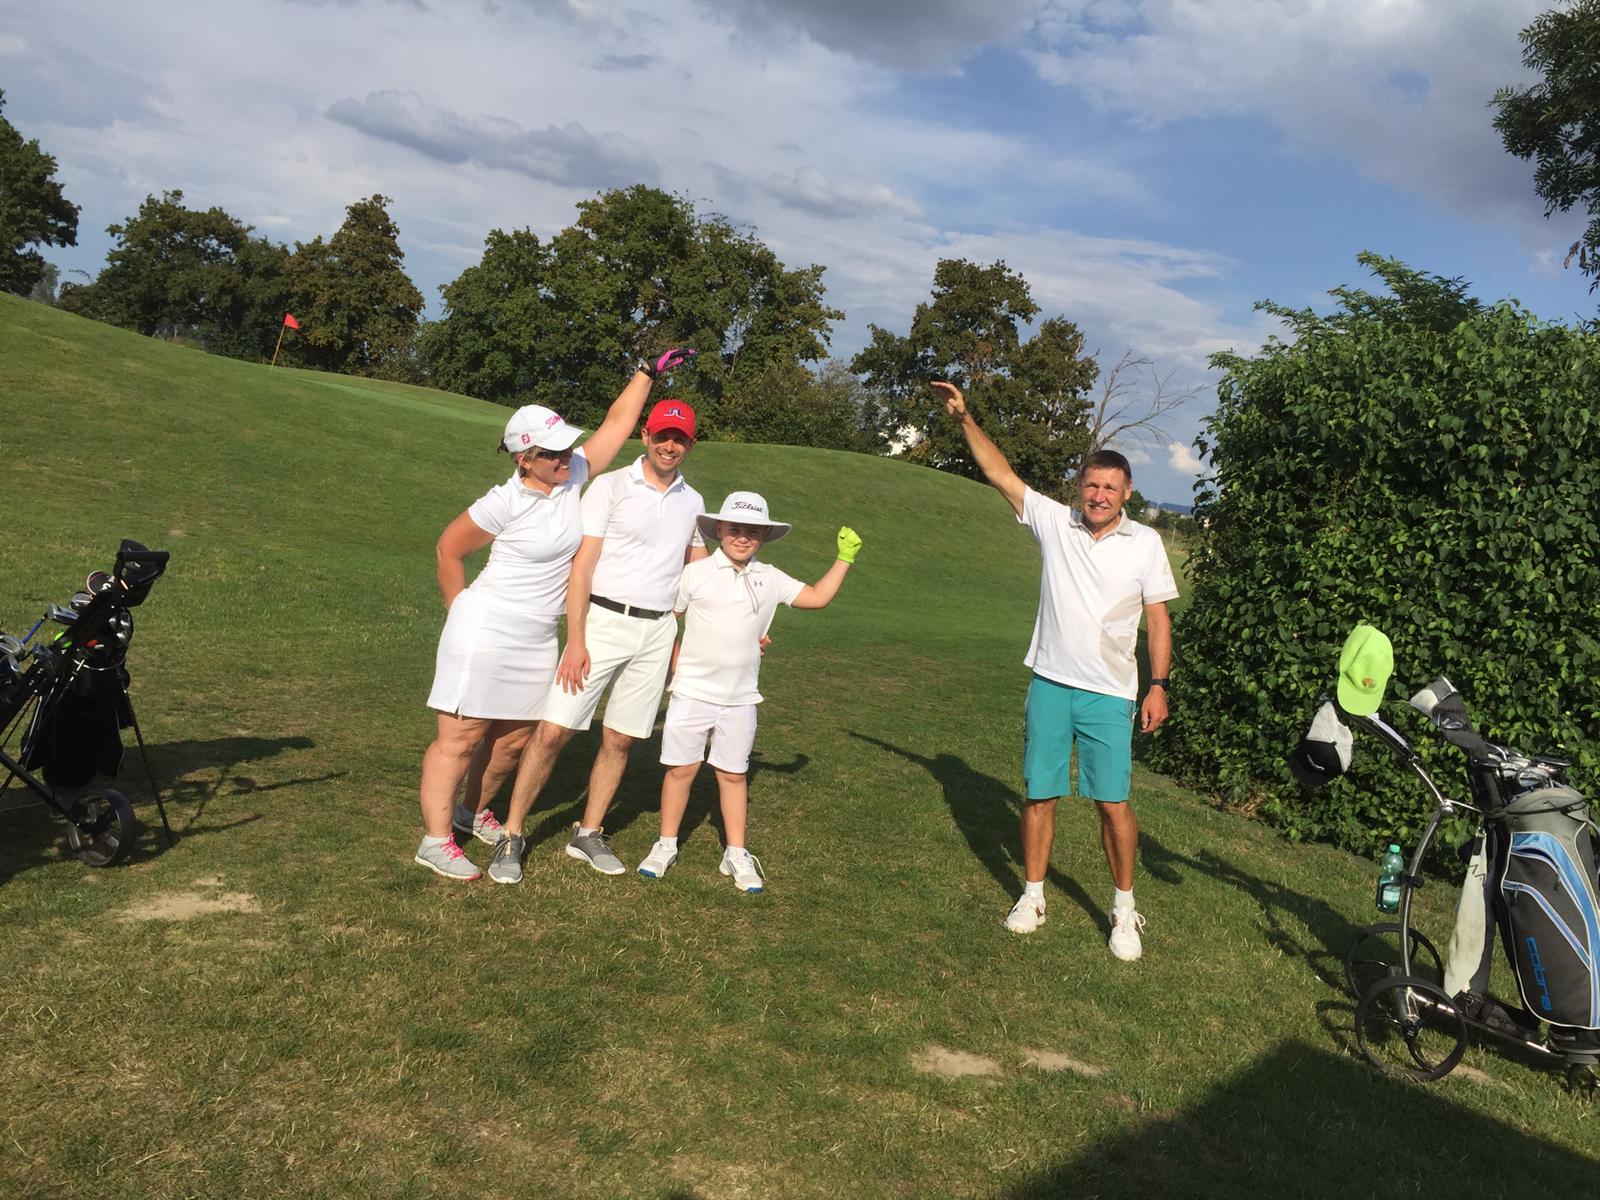 27_Golfturnier_Soroptimist_Golf_en_blanc